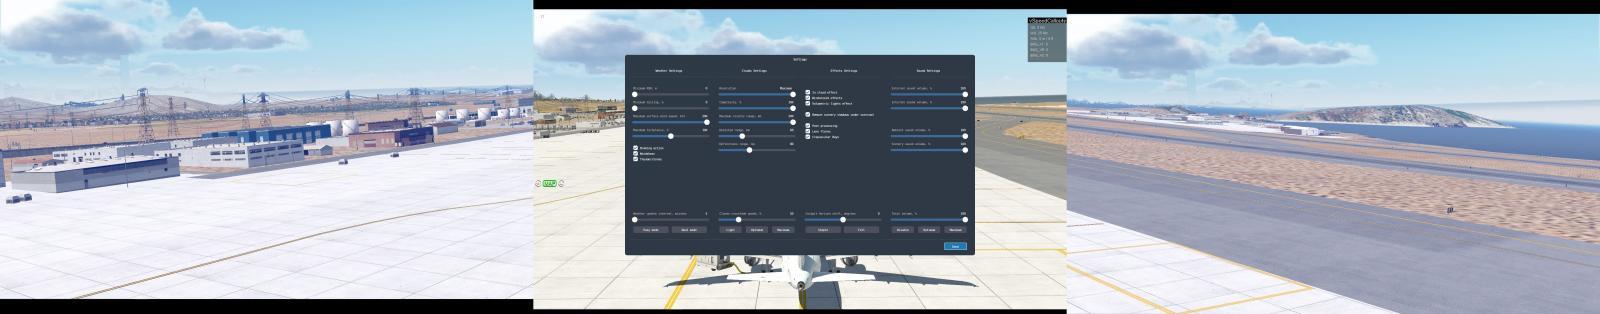 XE 1 08 Flashing Purple overlay - xEnviro - X-Plane Org Forum